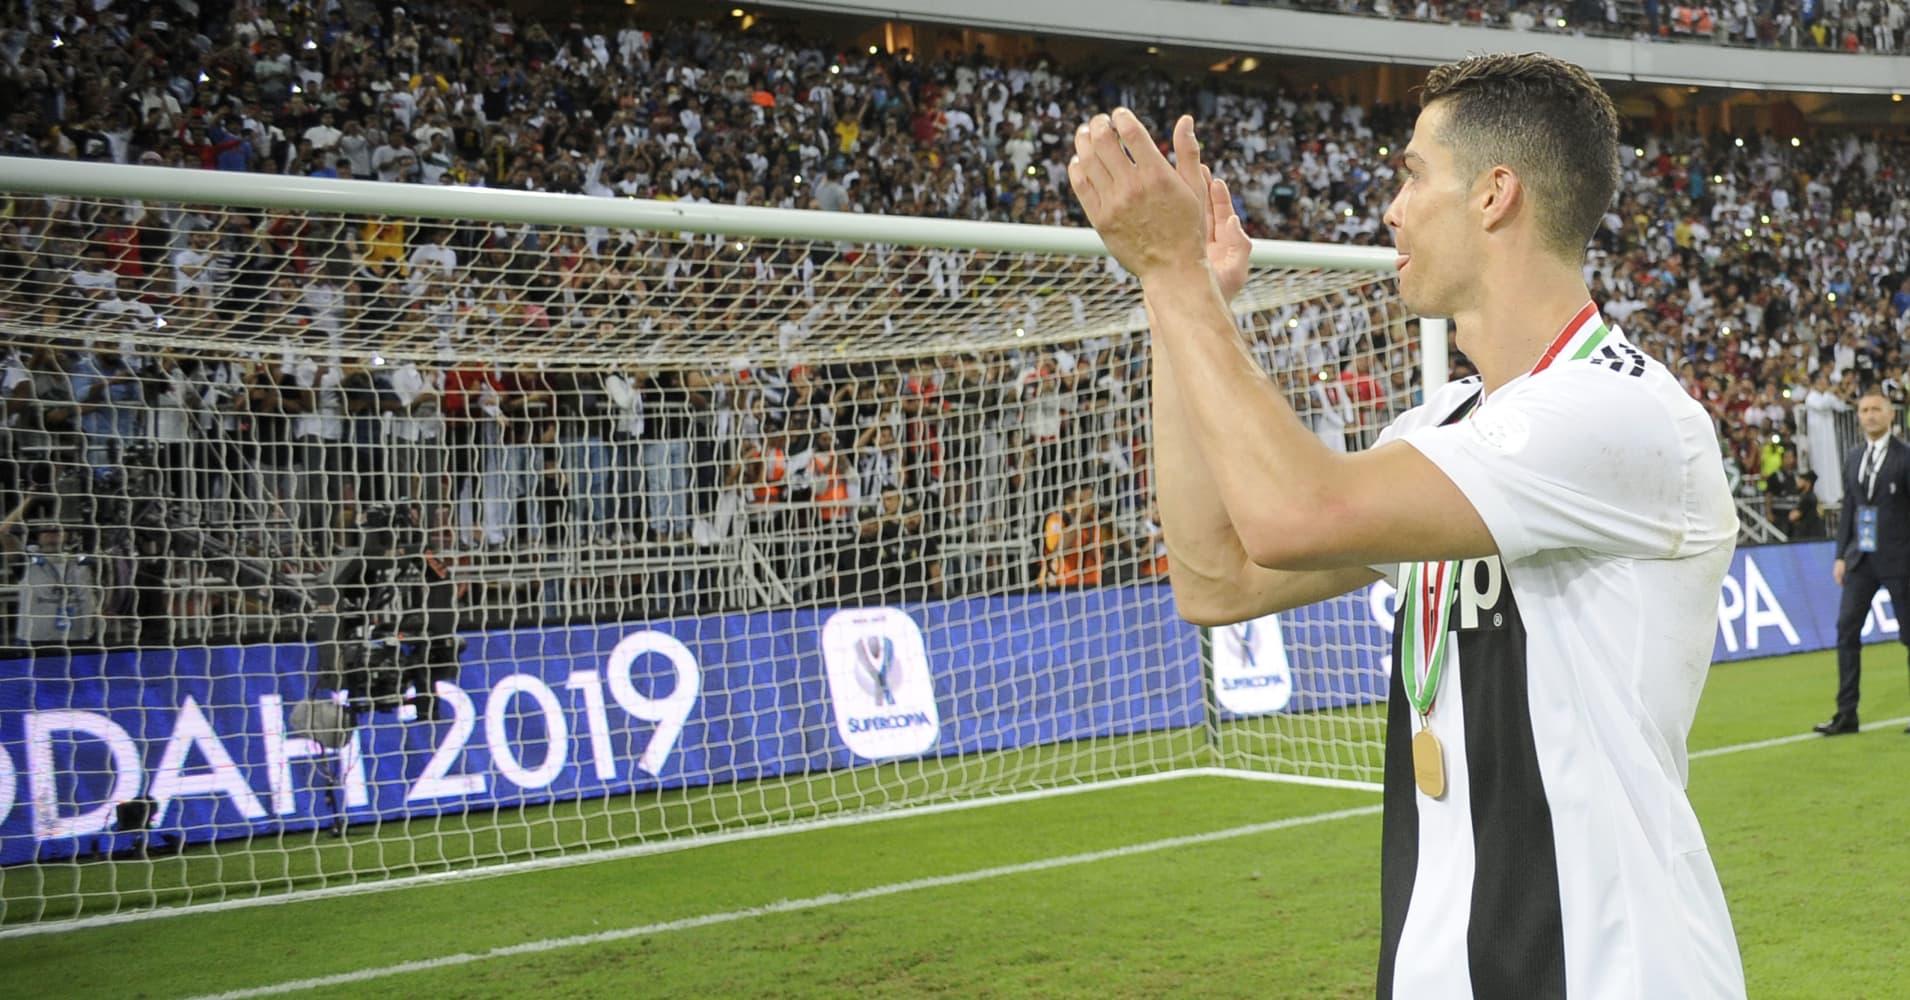 Cristiano Ronaldo's goal-scoring heroics sends Juventus shares soaring 17 percent